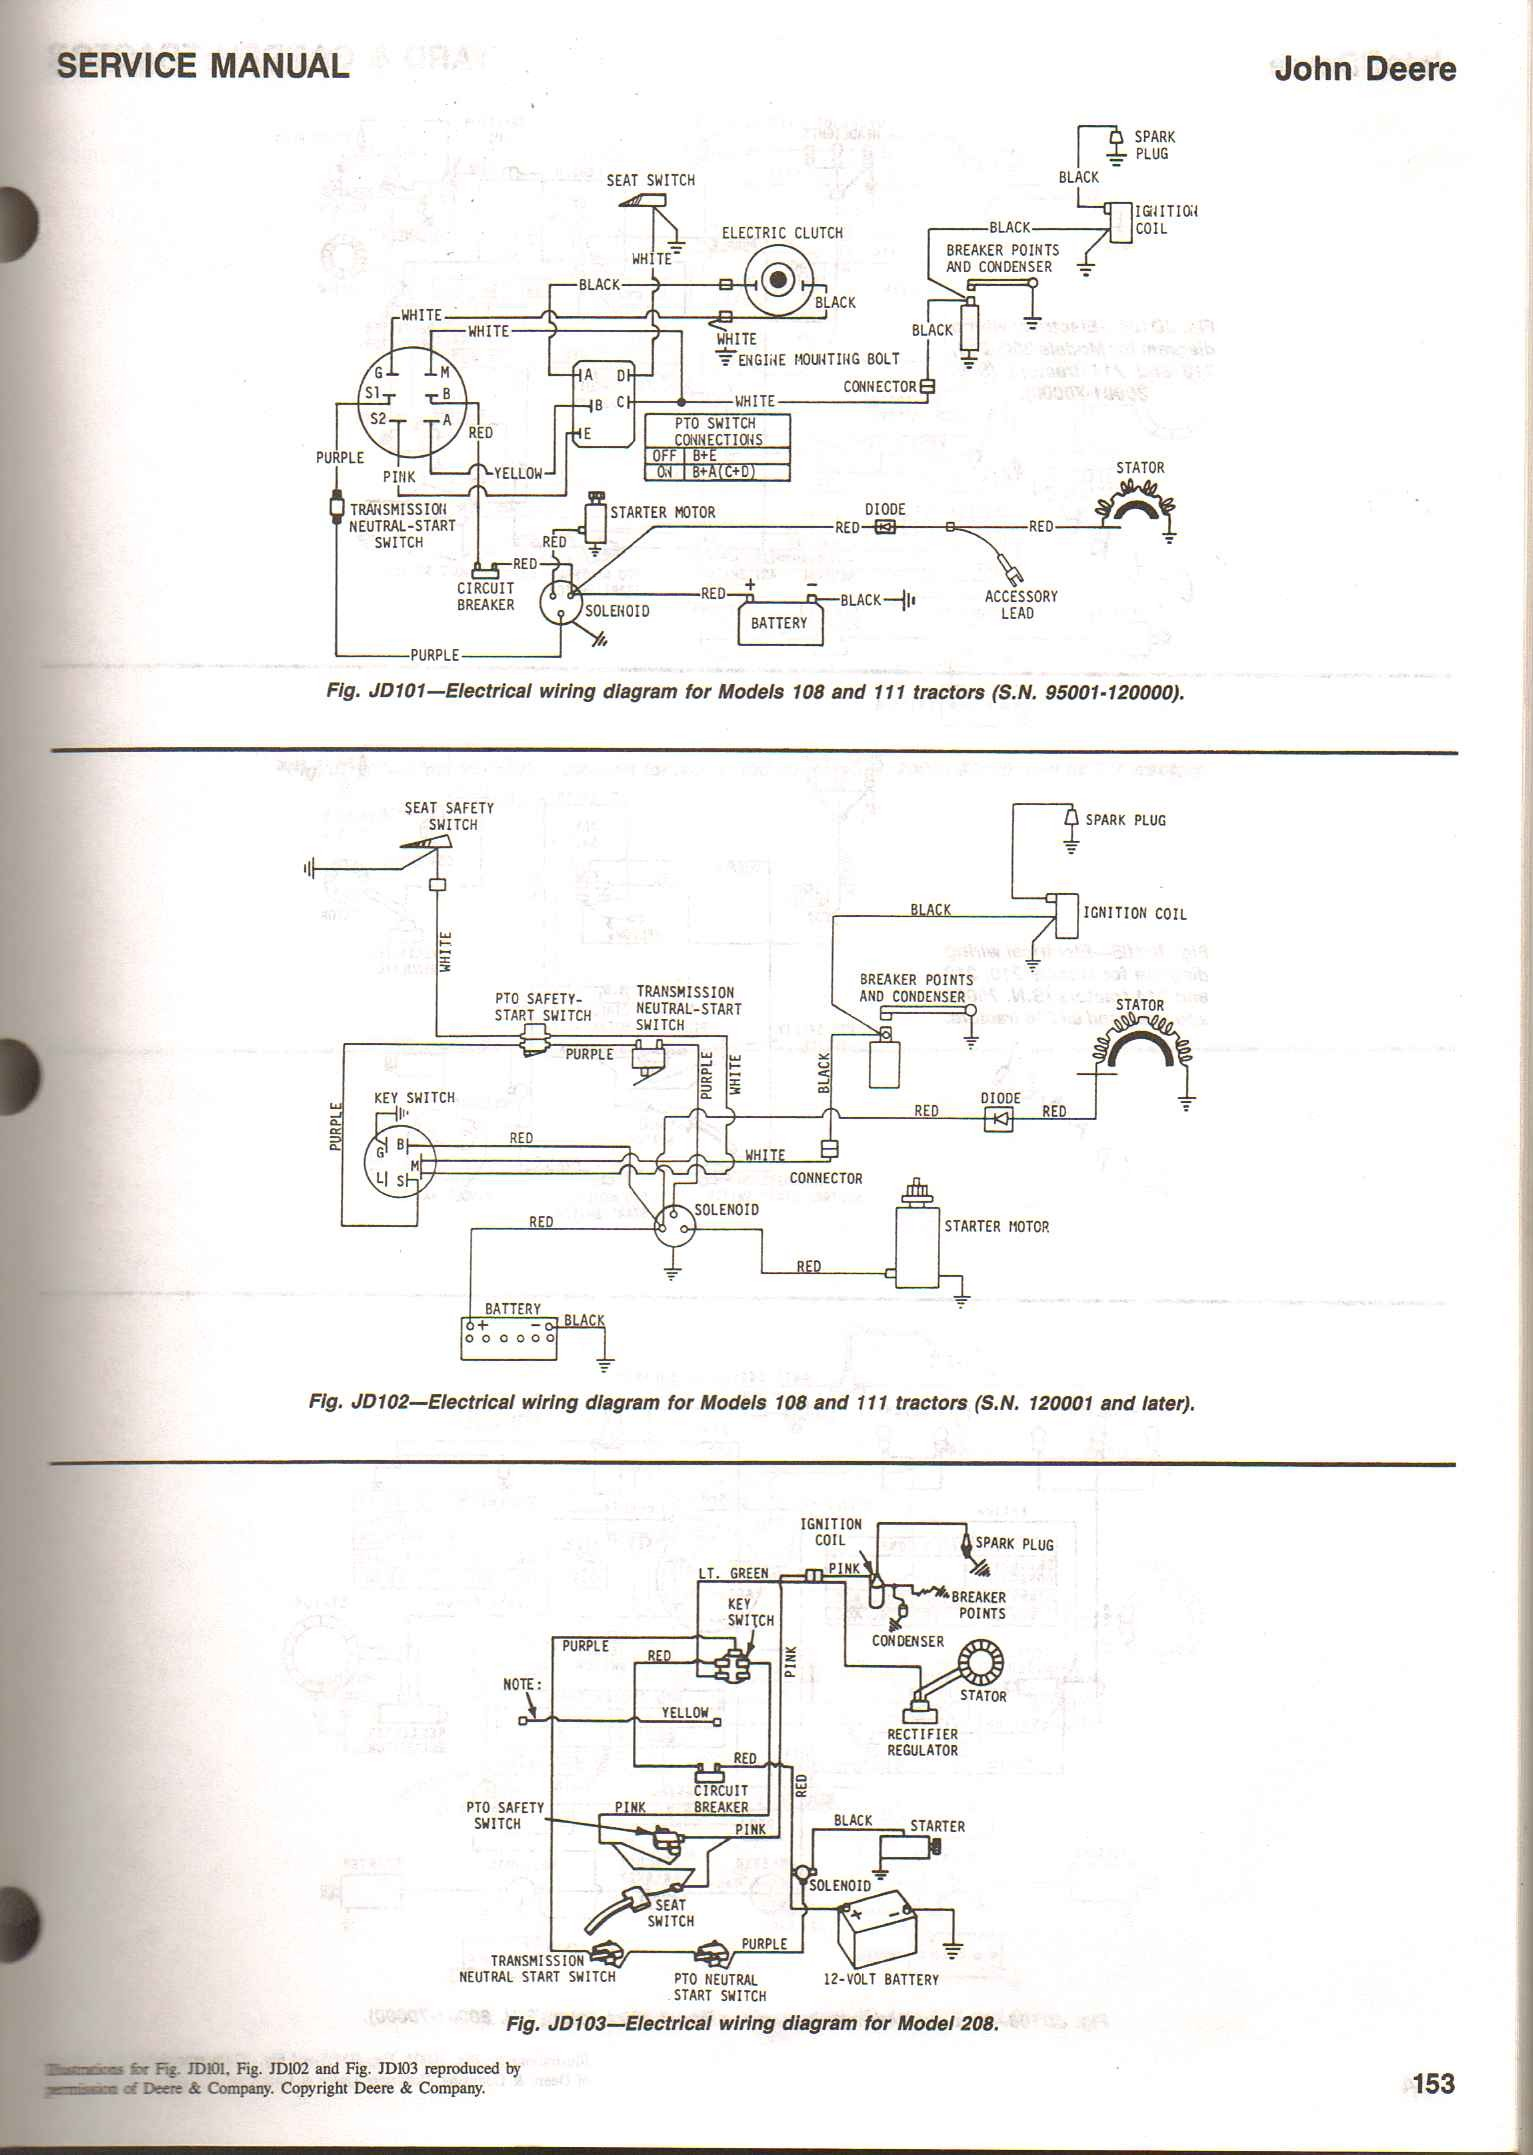 John Deere 345 Lawn Tractor Wiring Diagram Diagram] John Deere 108 Wiring Diagram Full Version Hd Of John Deere 345 Lawn Tractor Wiring Diagram